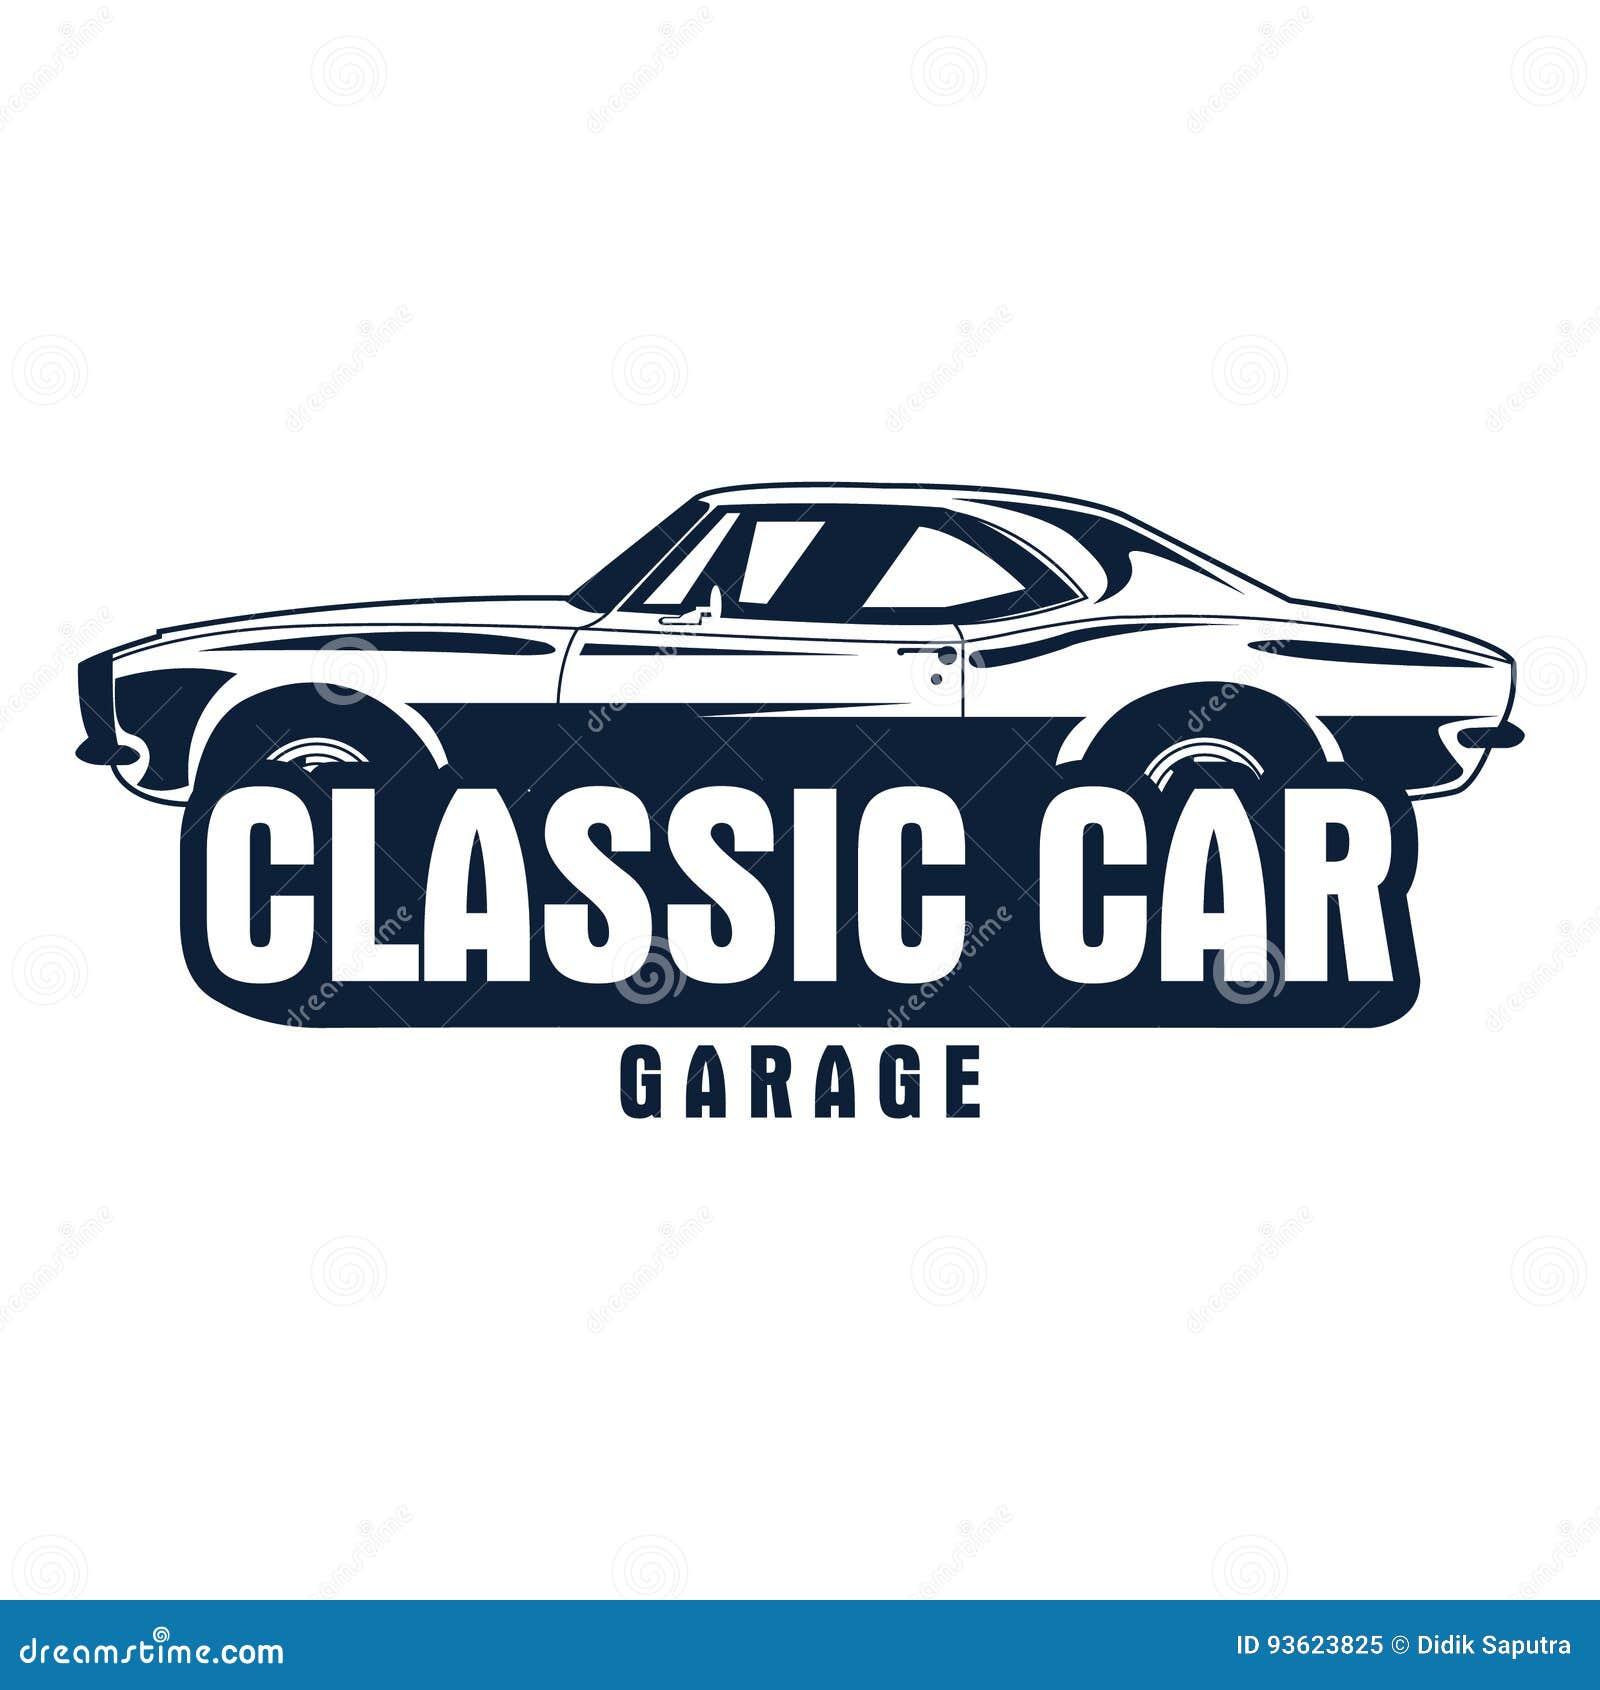 Classic Car Logo Stock Vector. Illustration Of Letter